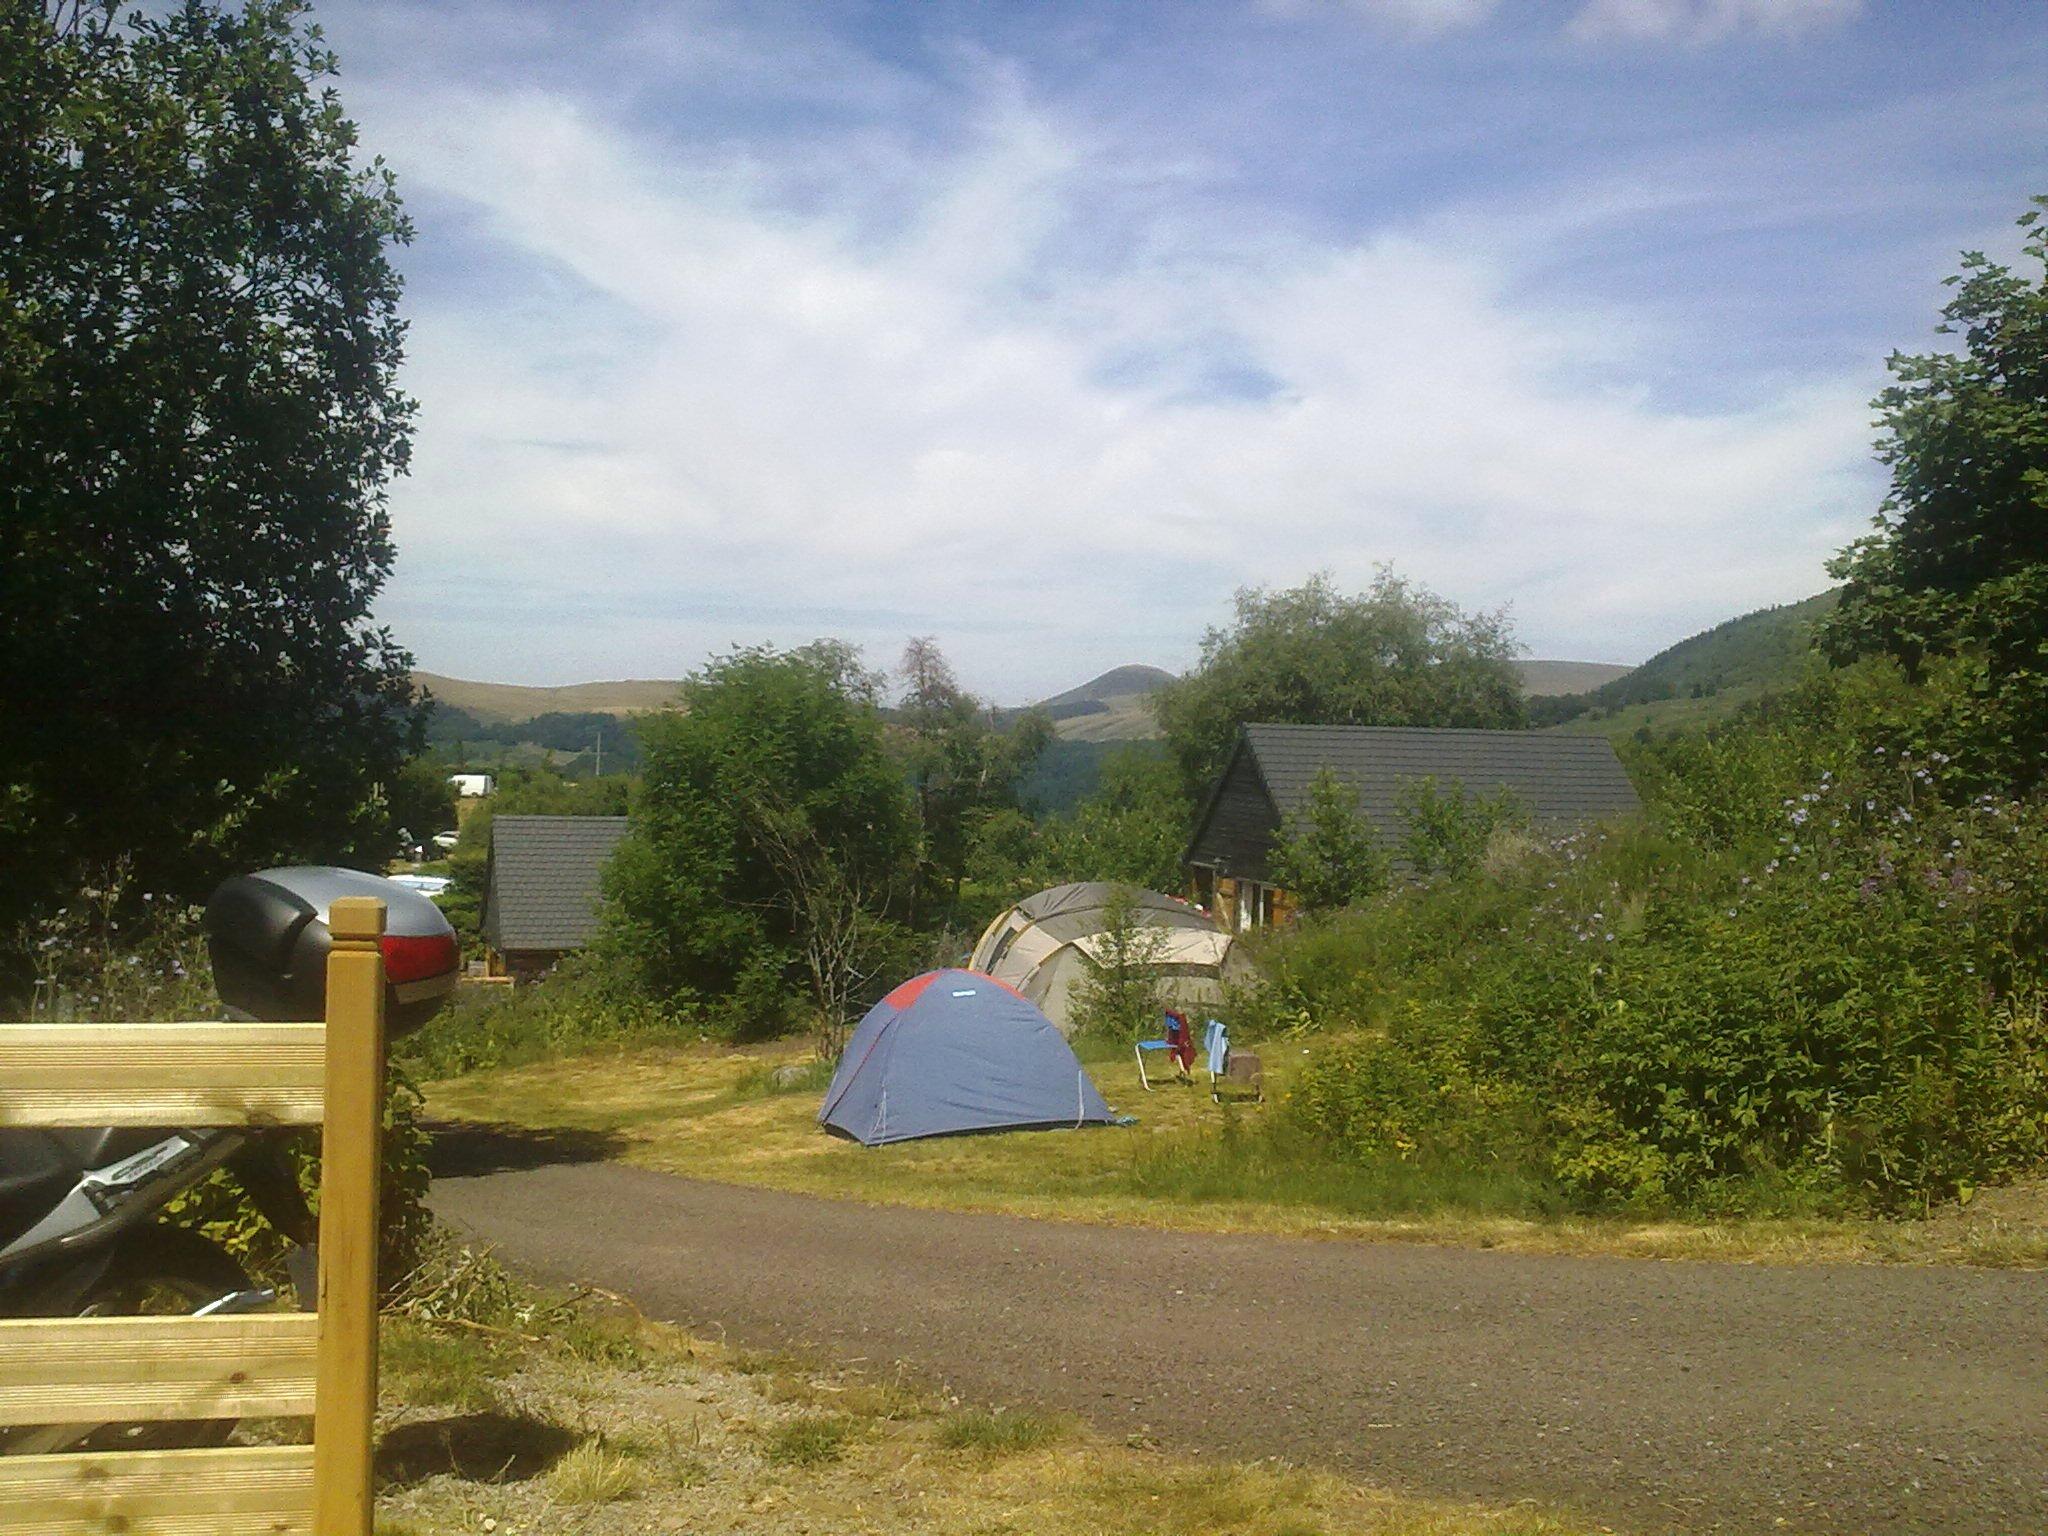 auvergne-camping mont dore-cabane 2